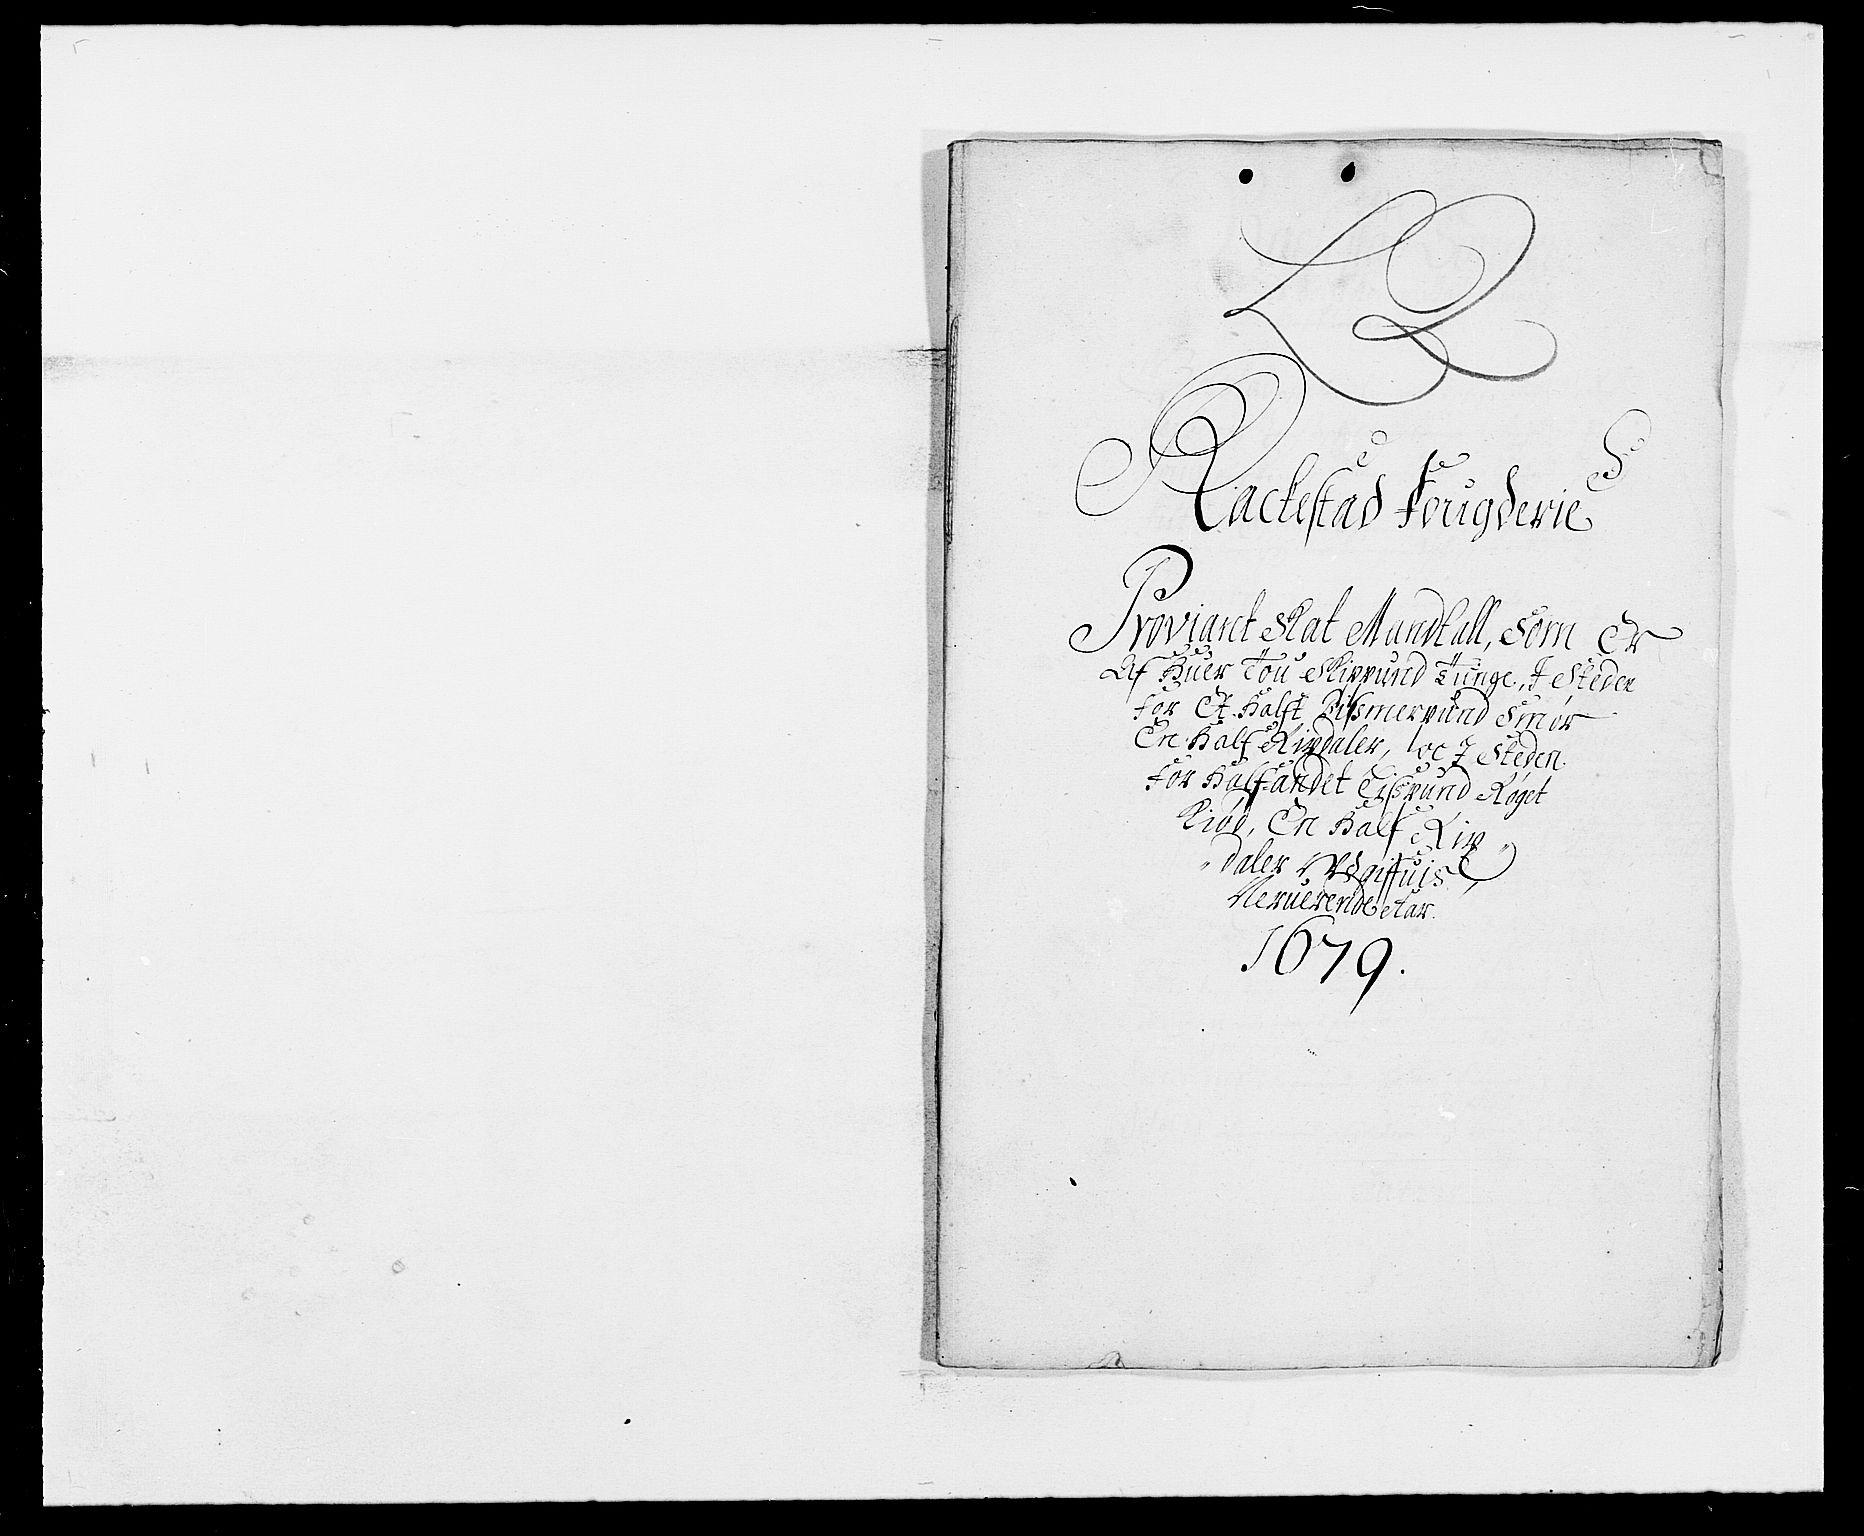 RA, Rentekammeret inntil 1814, Reviderte regnskaper, Fogderegnskap, R05/L0271: Fogderegnskap Rakkestad, 1678-1679, s. 362